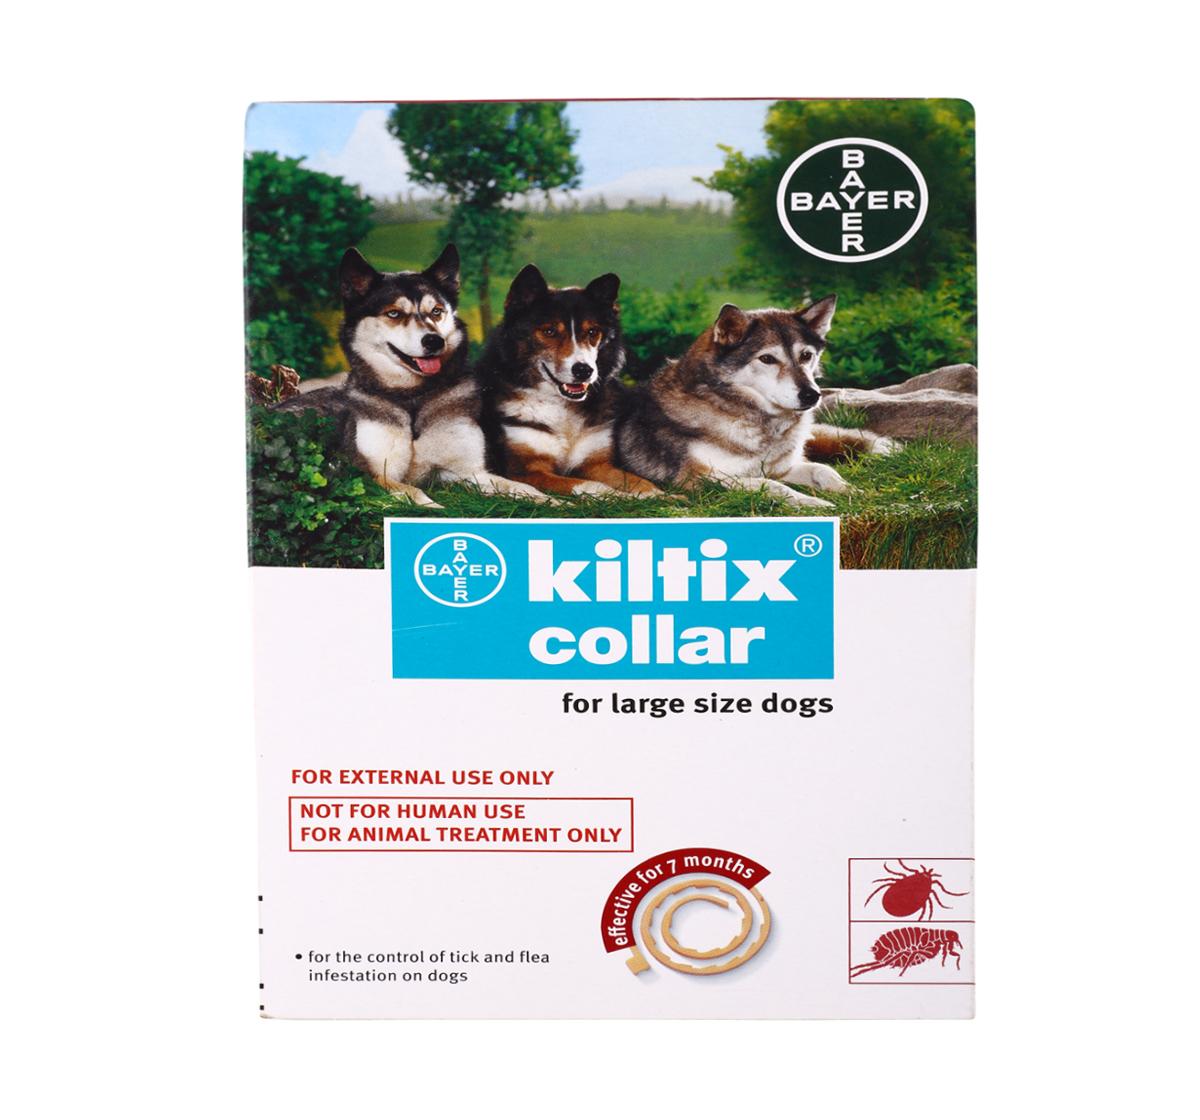 Kiltix Collar Large Bayer Dogspot Online Pet Supply Store